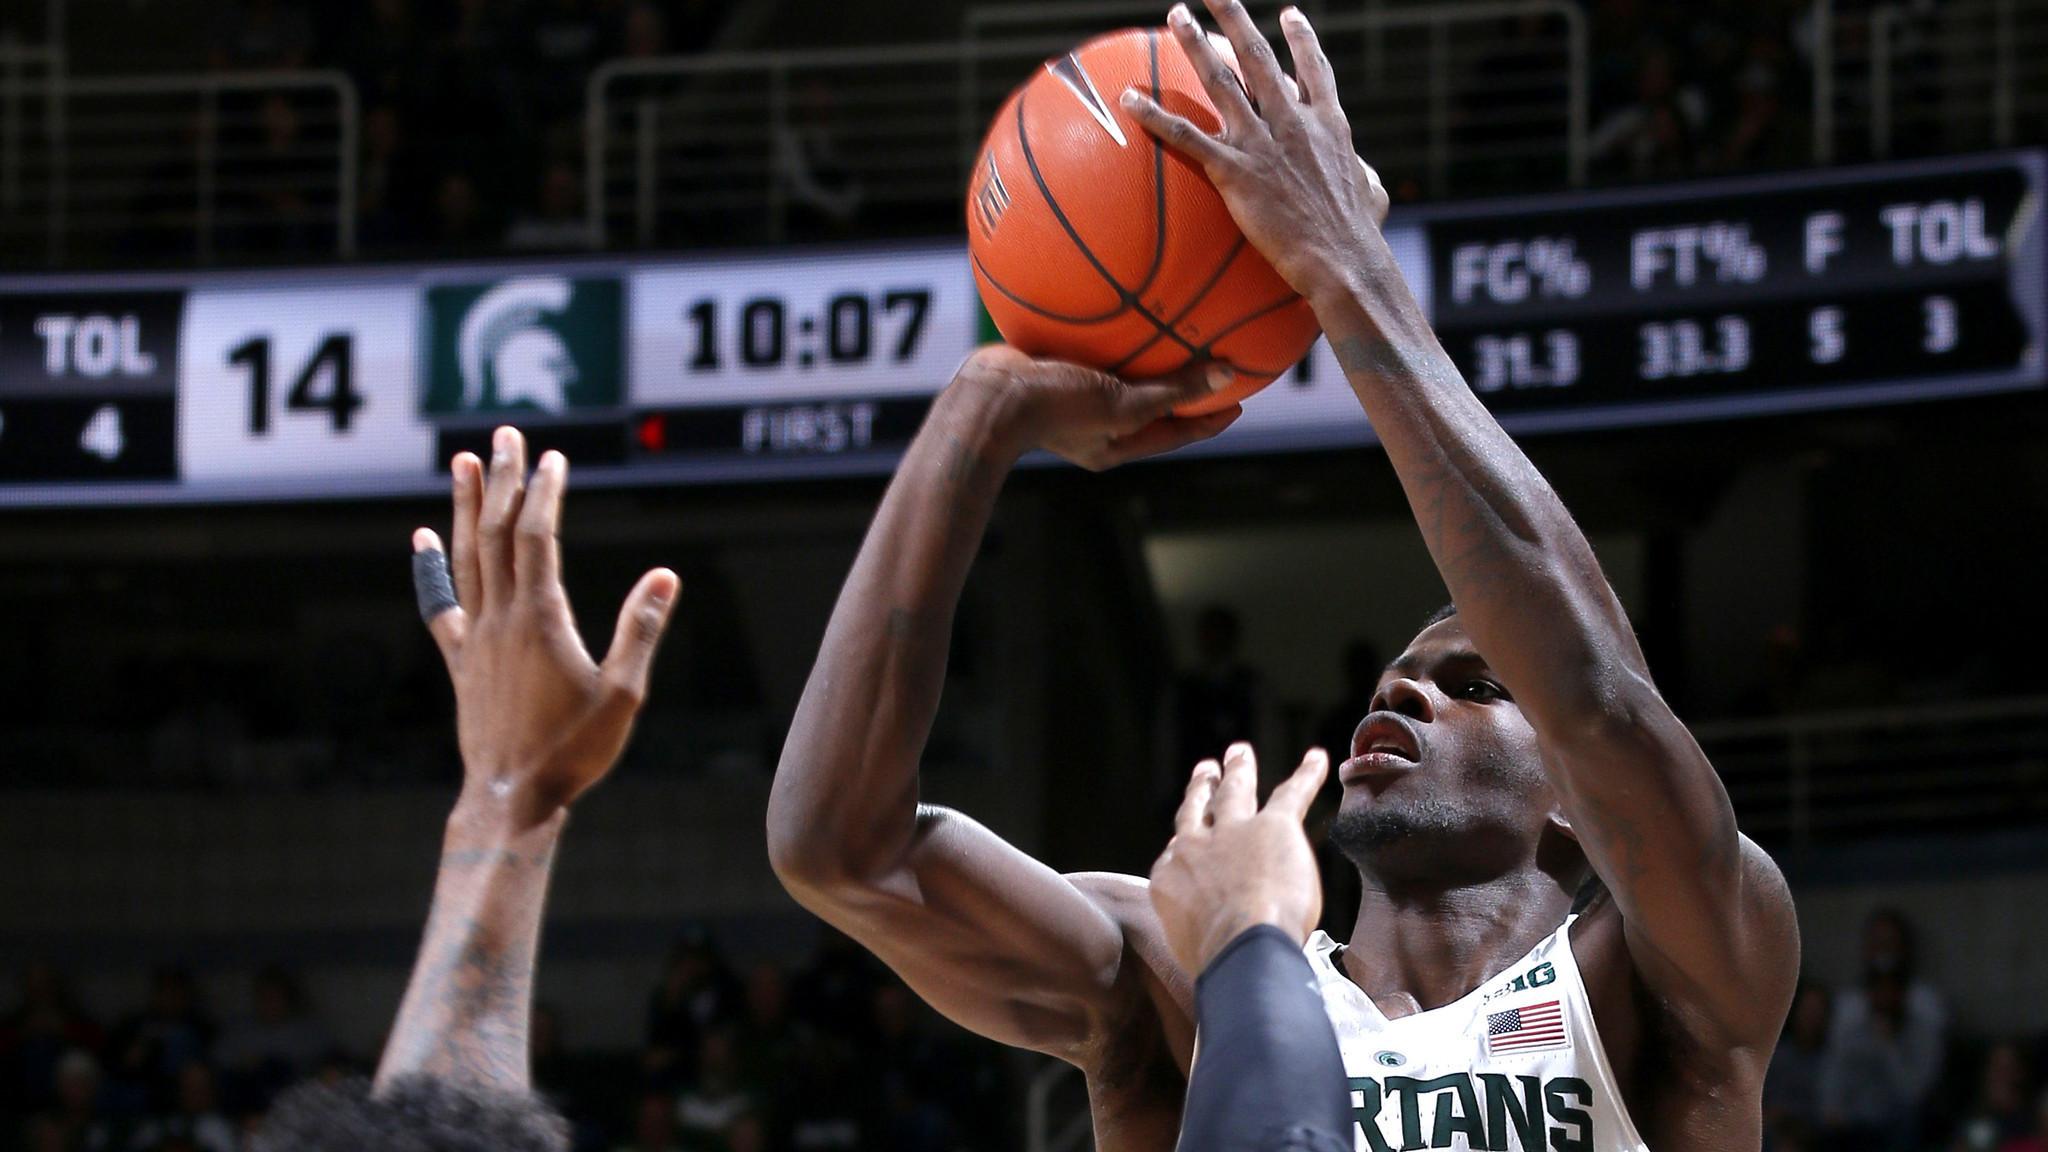 La-sp-college-basketball-roundup-20161120